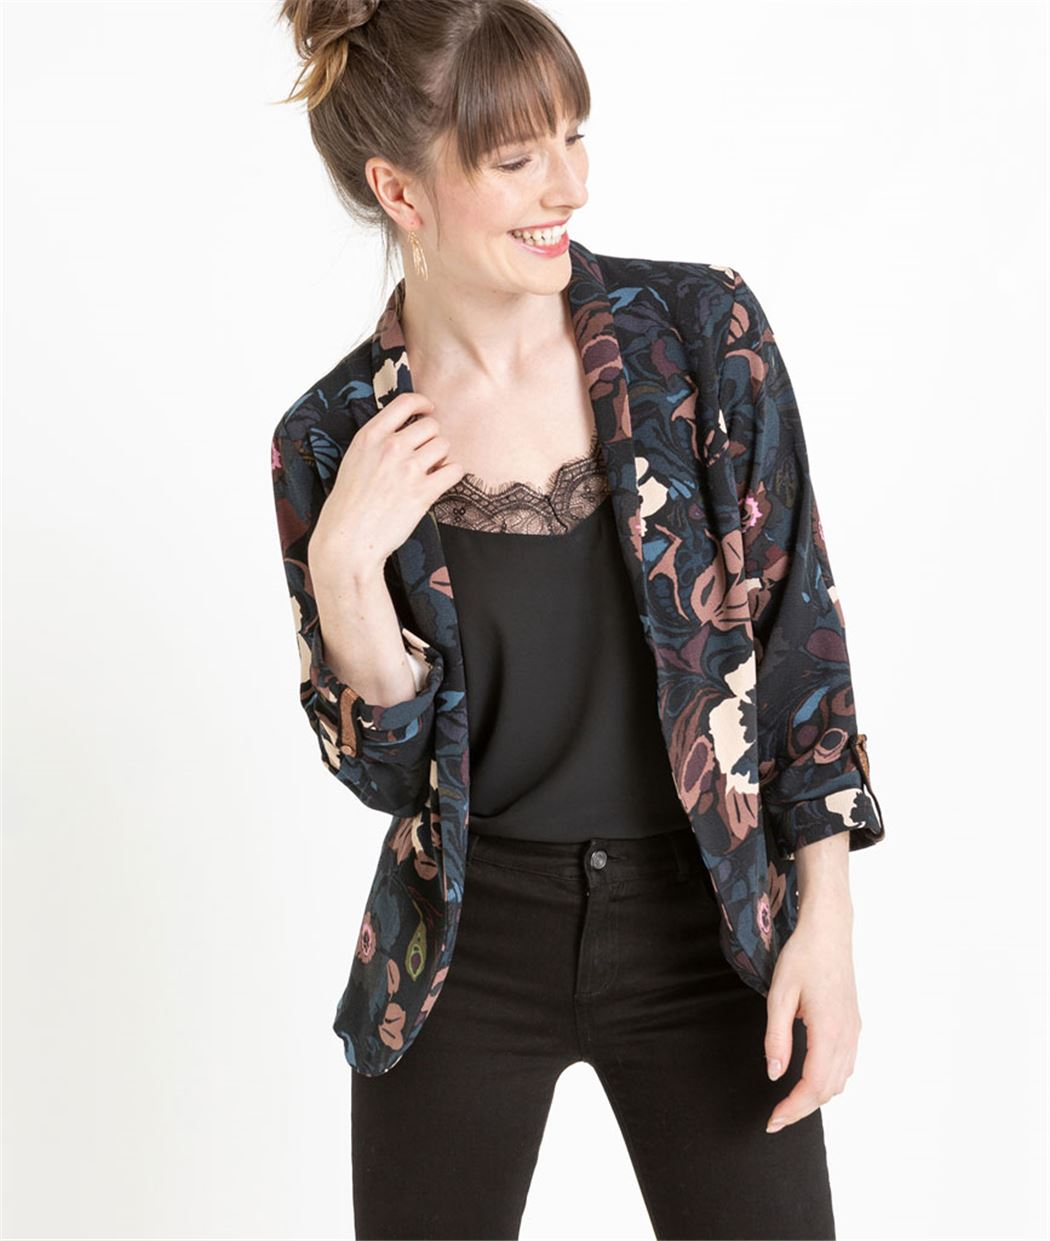 Veste tailleur femme imprimée BLEU